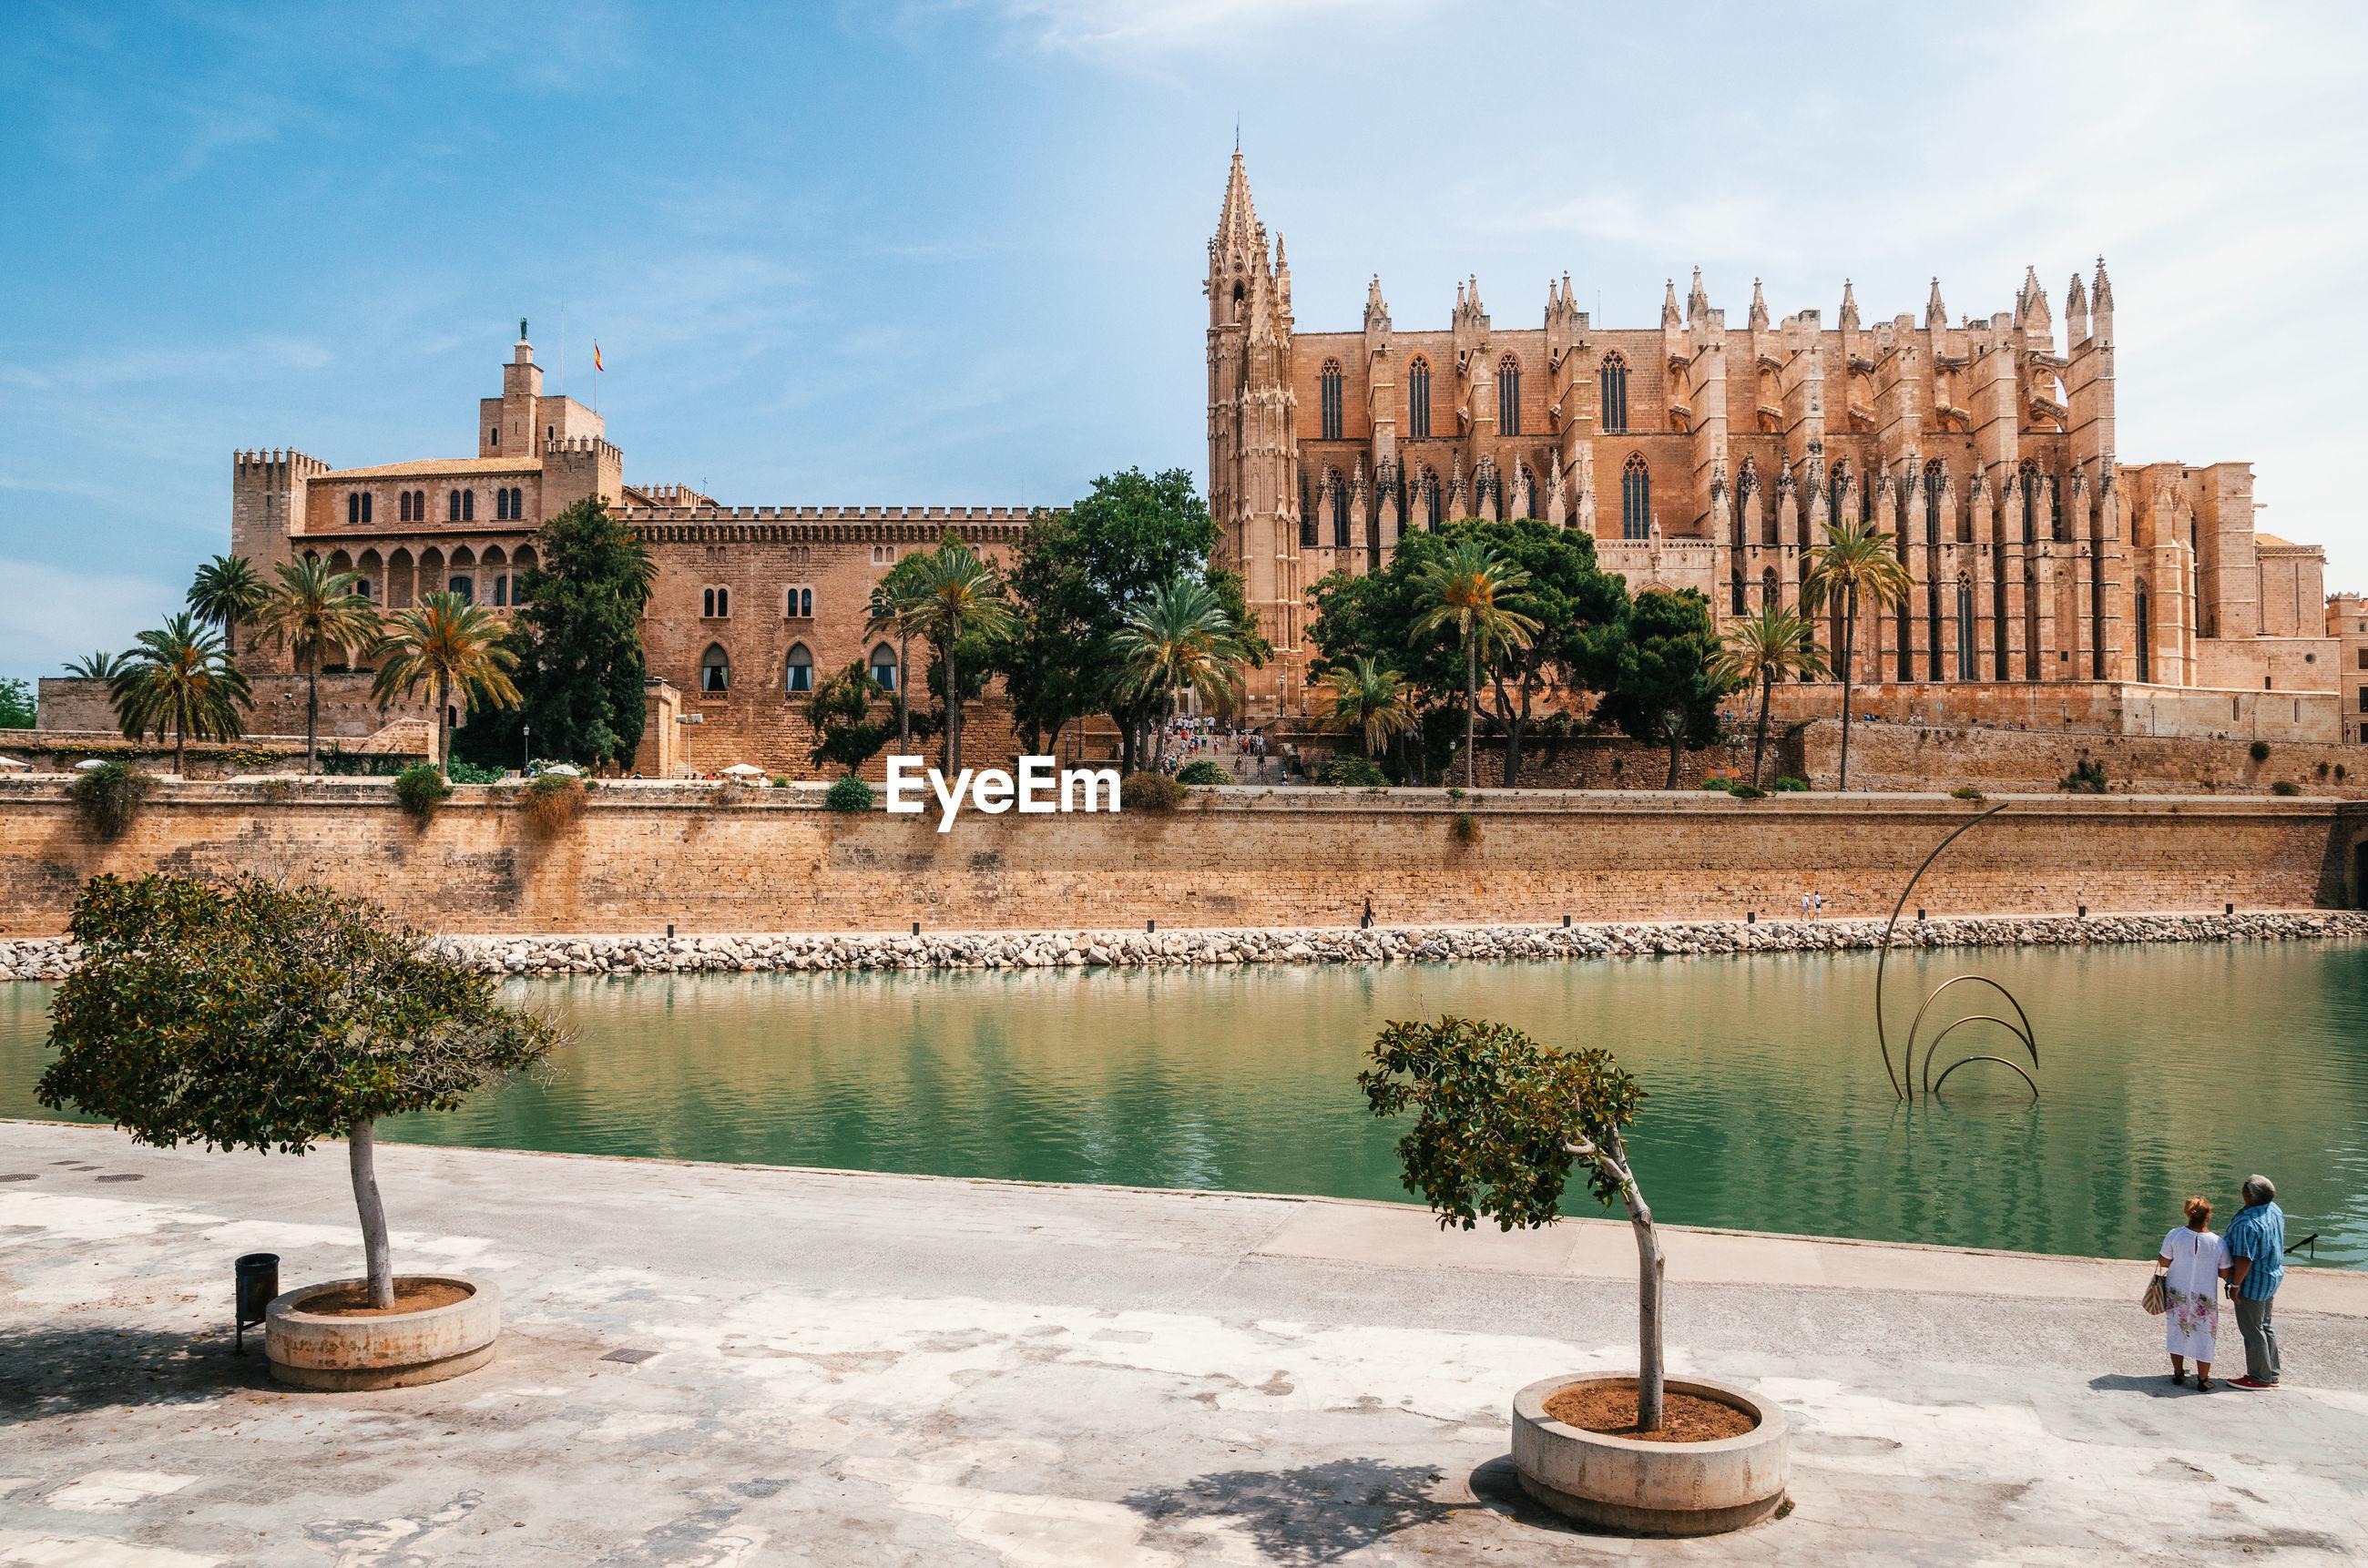 Palma cathedral and royal palace of la almudaina by river